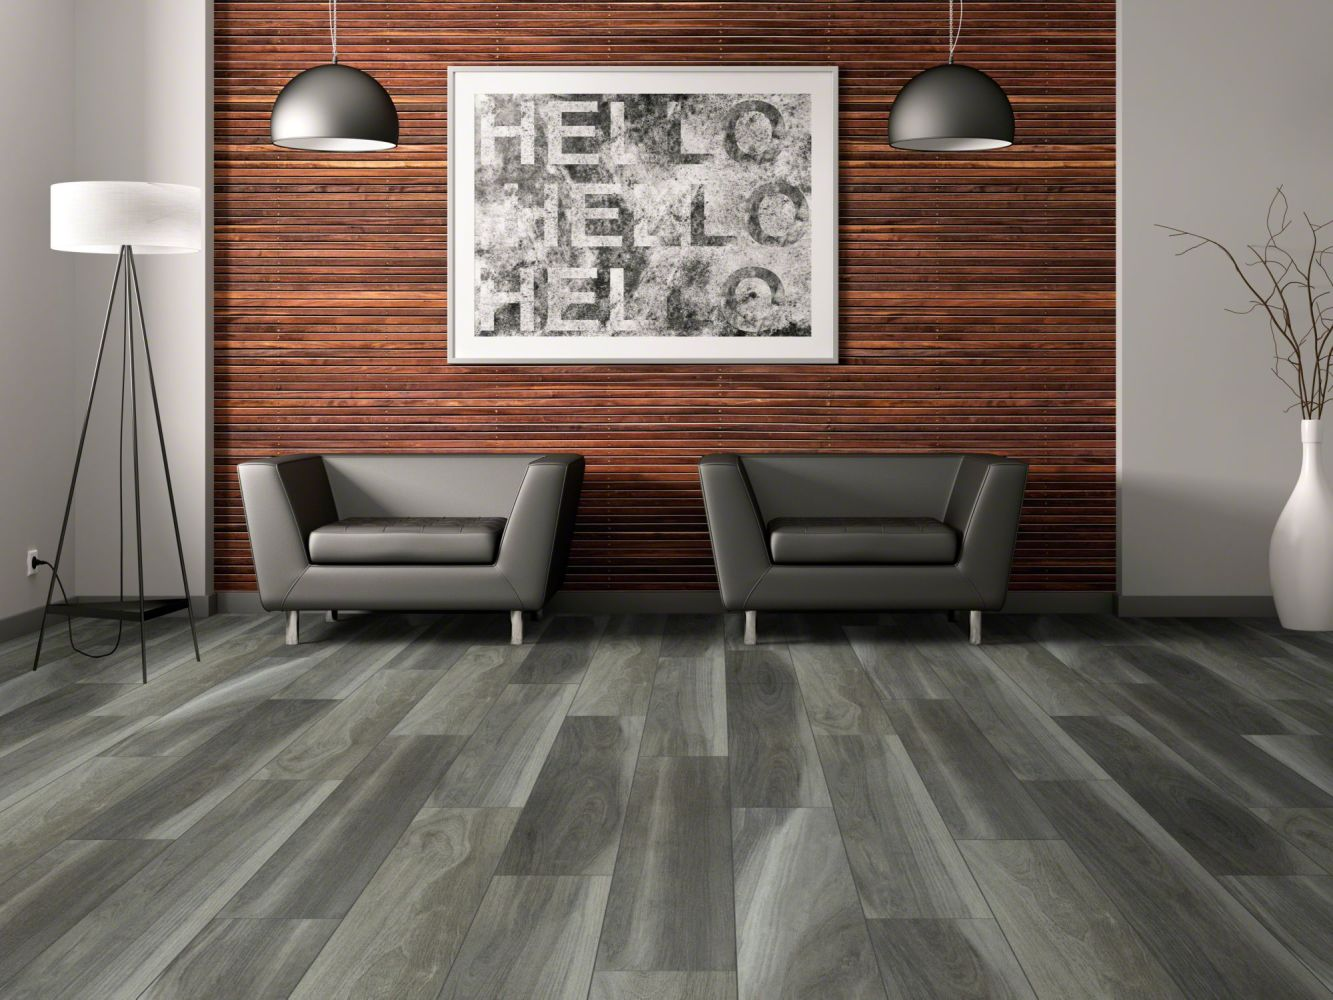 Shaw Floors Nfa HS Beaver Creek Charred Oak 05009_VH544